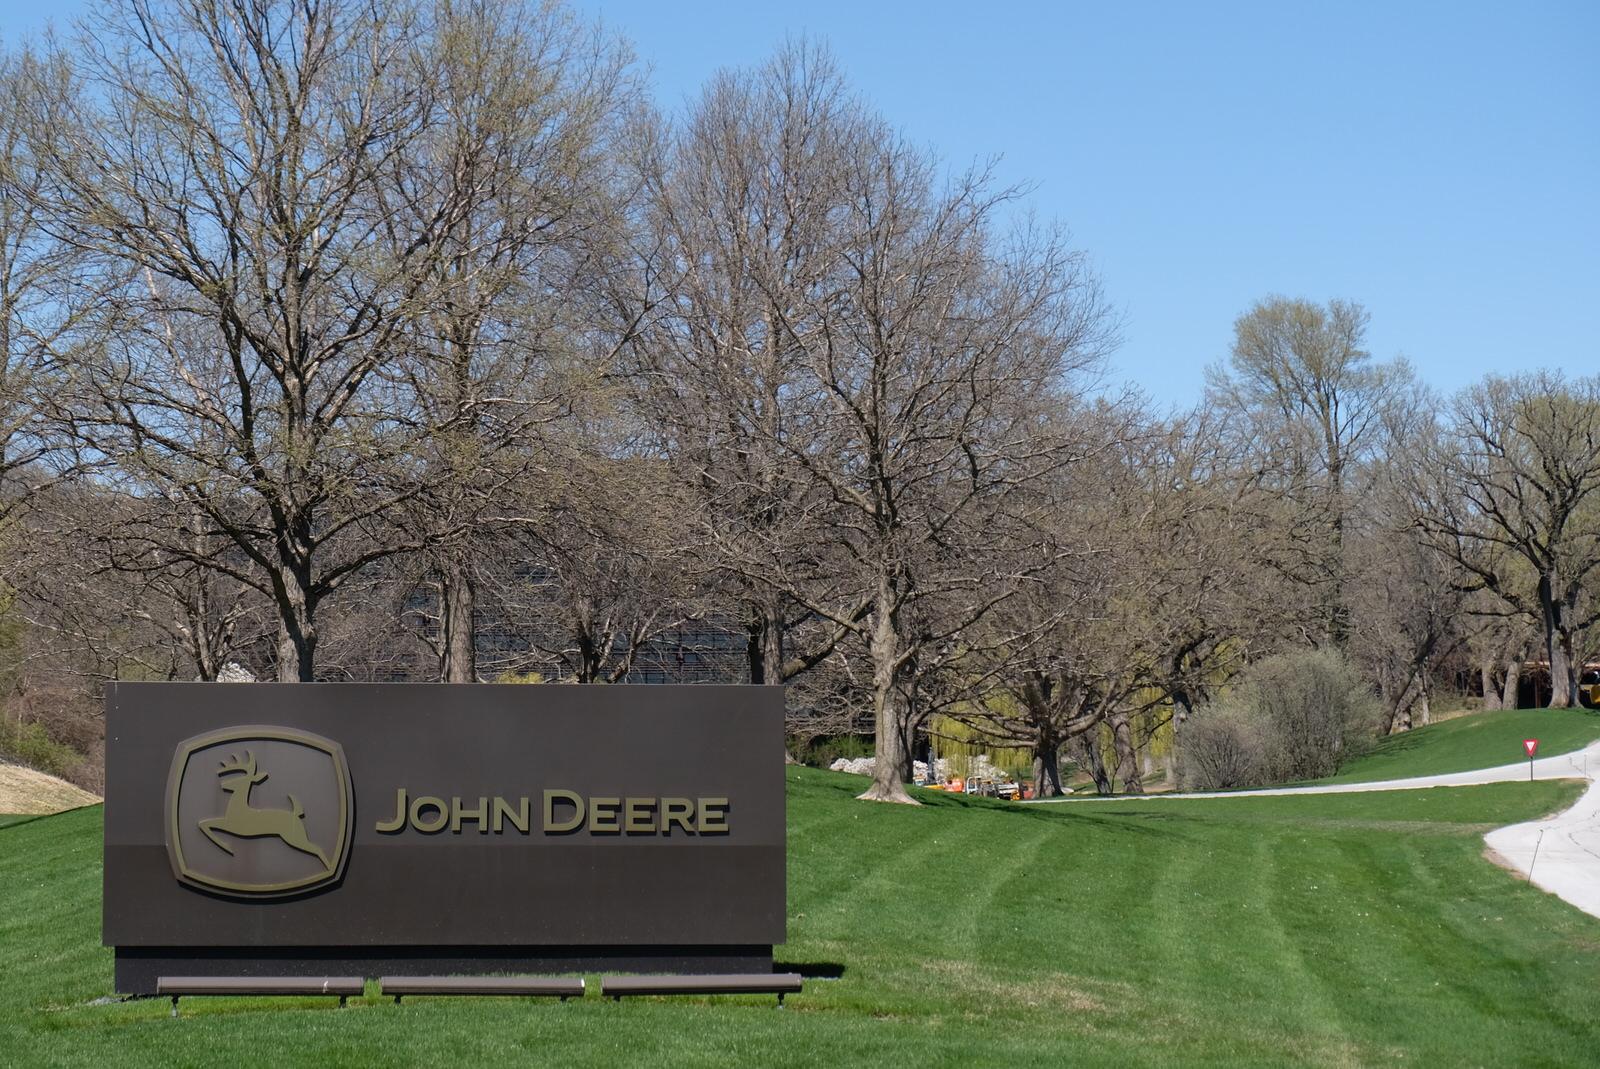 Entrance to Deere's corporate headquarters in Moline, Illinois.